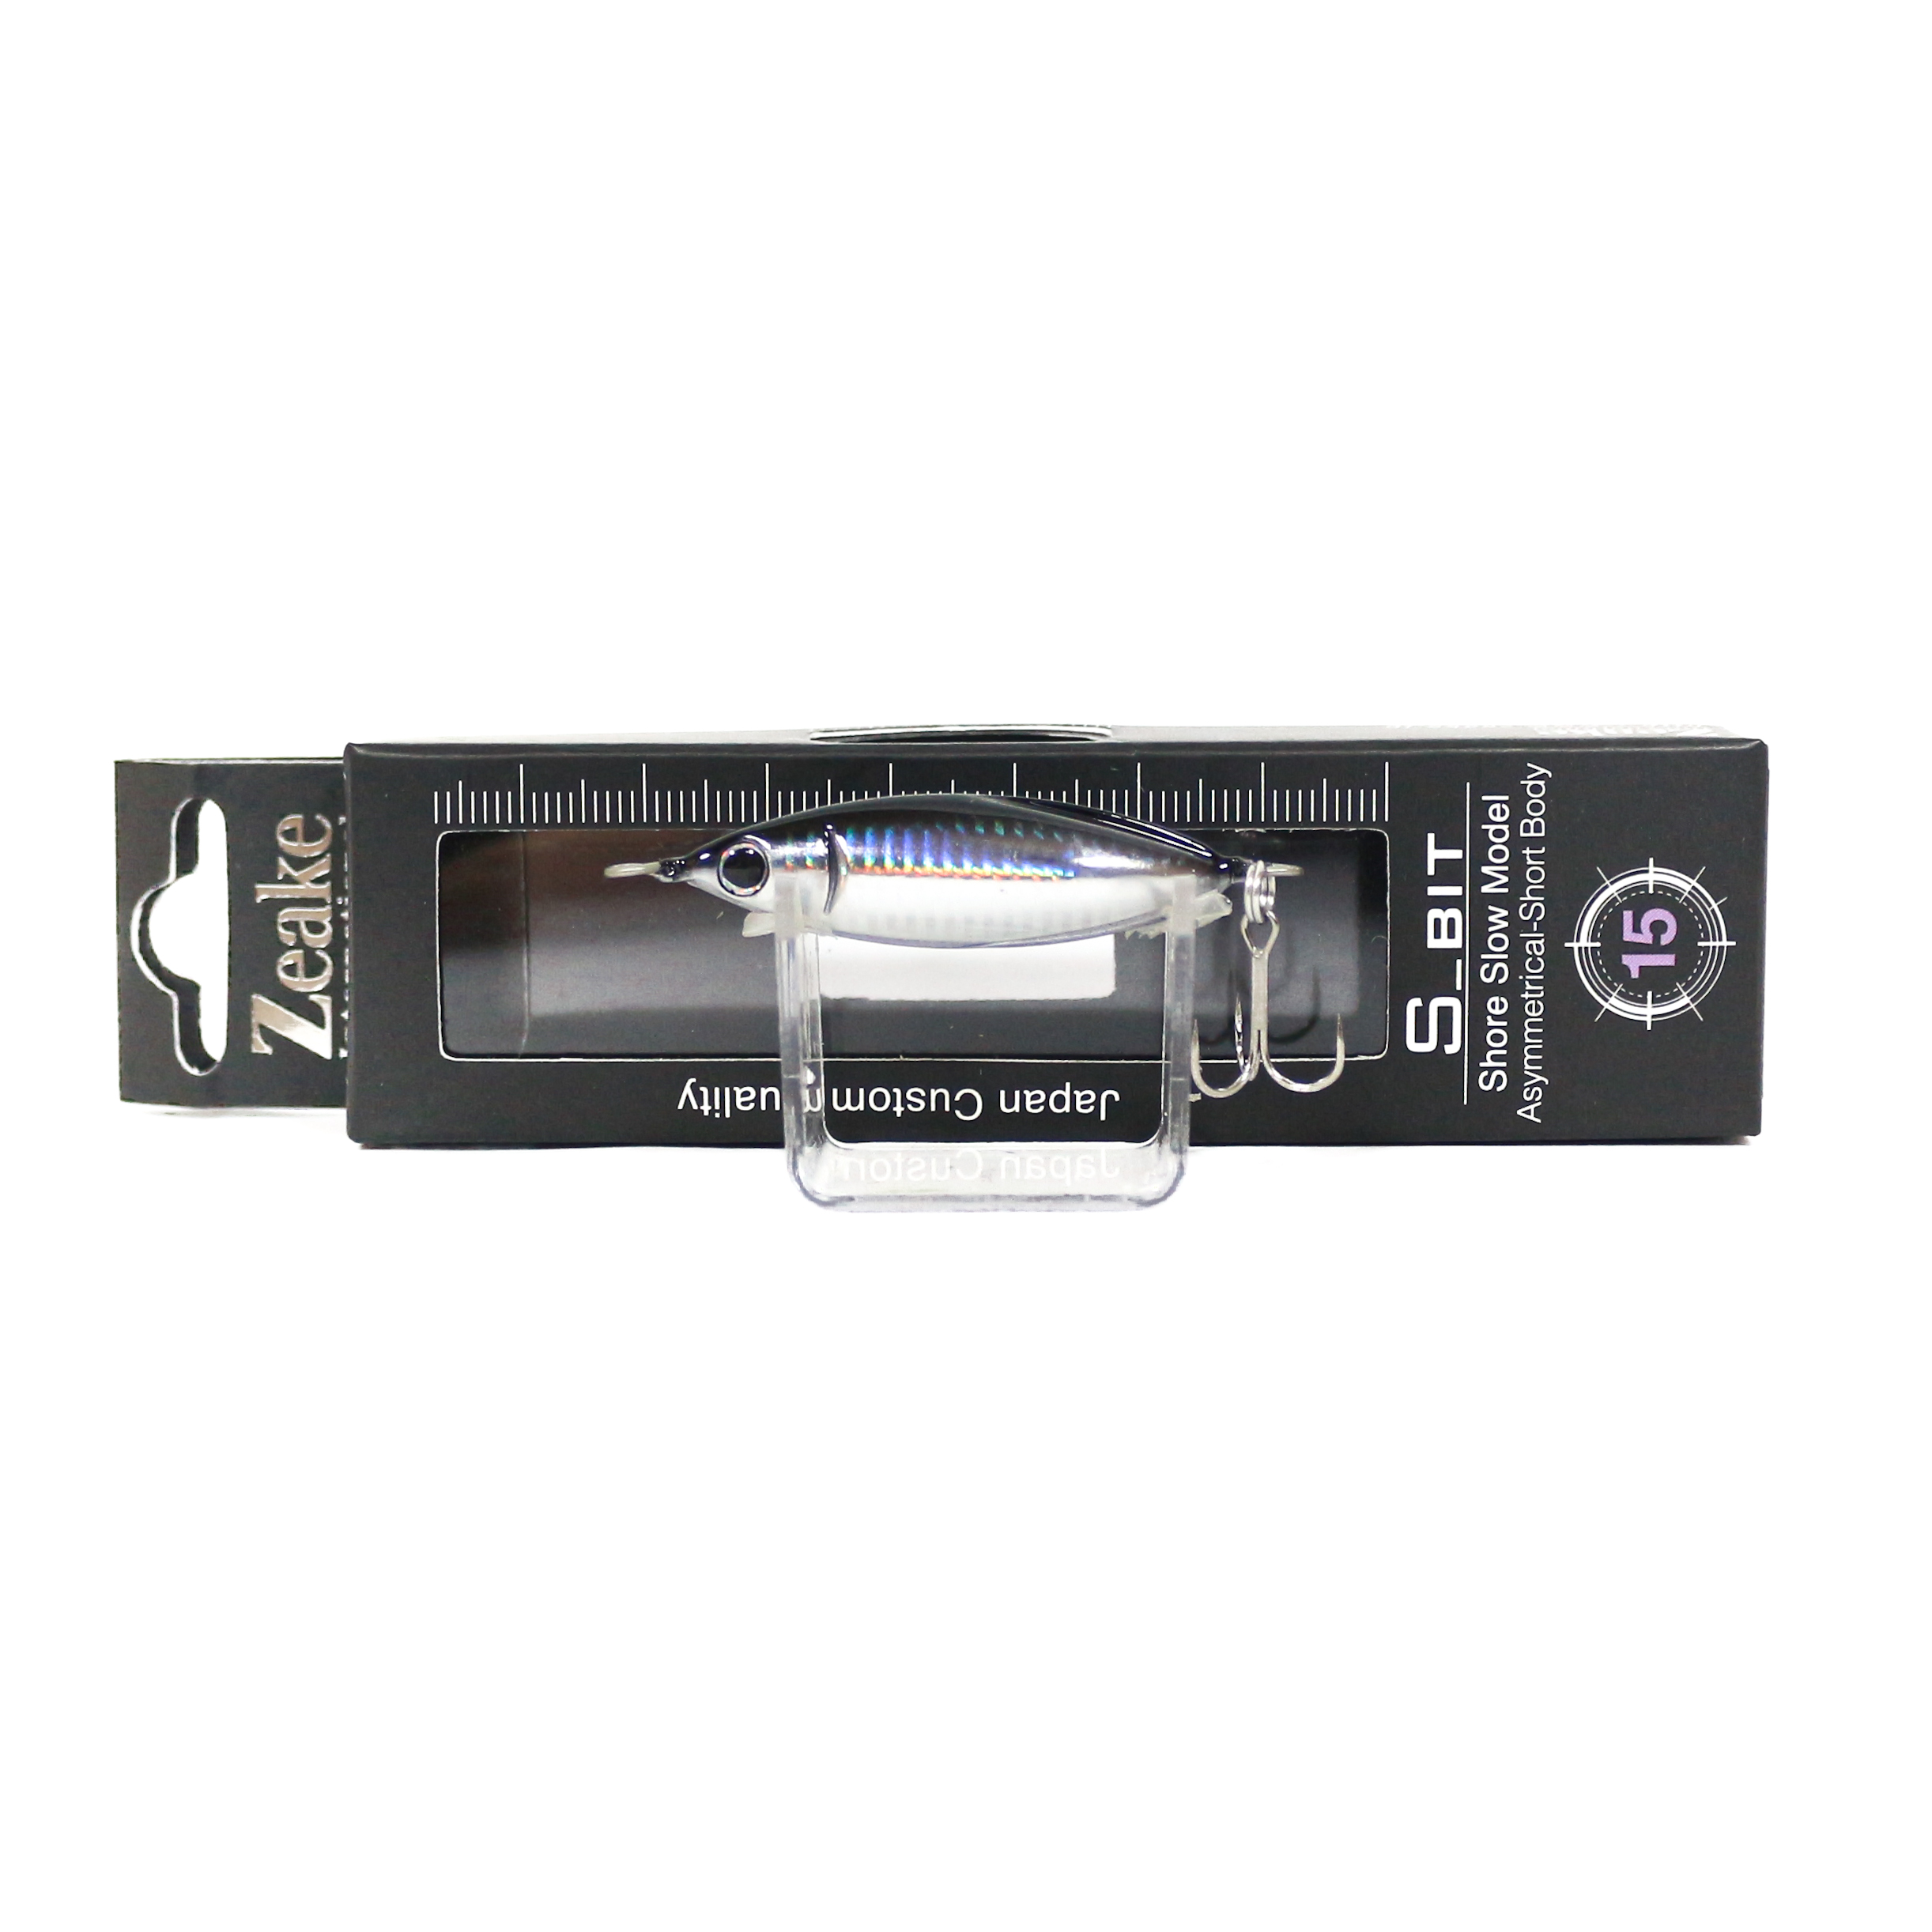 Zeake Metal Jig S Bit 15 grams 04 (0956)